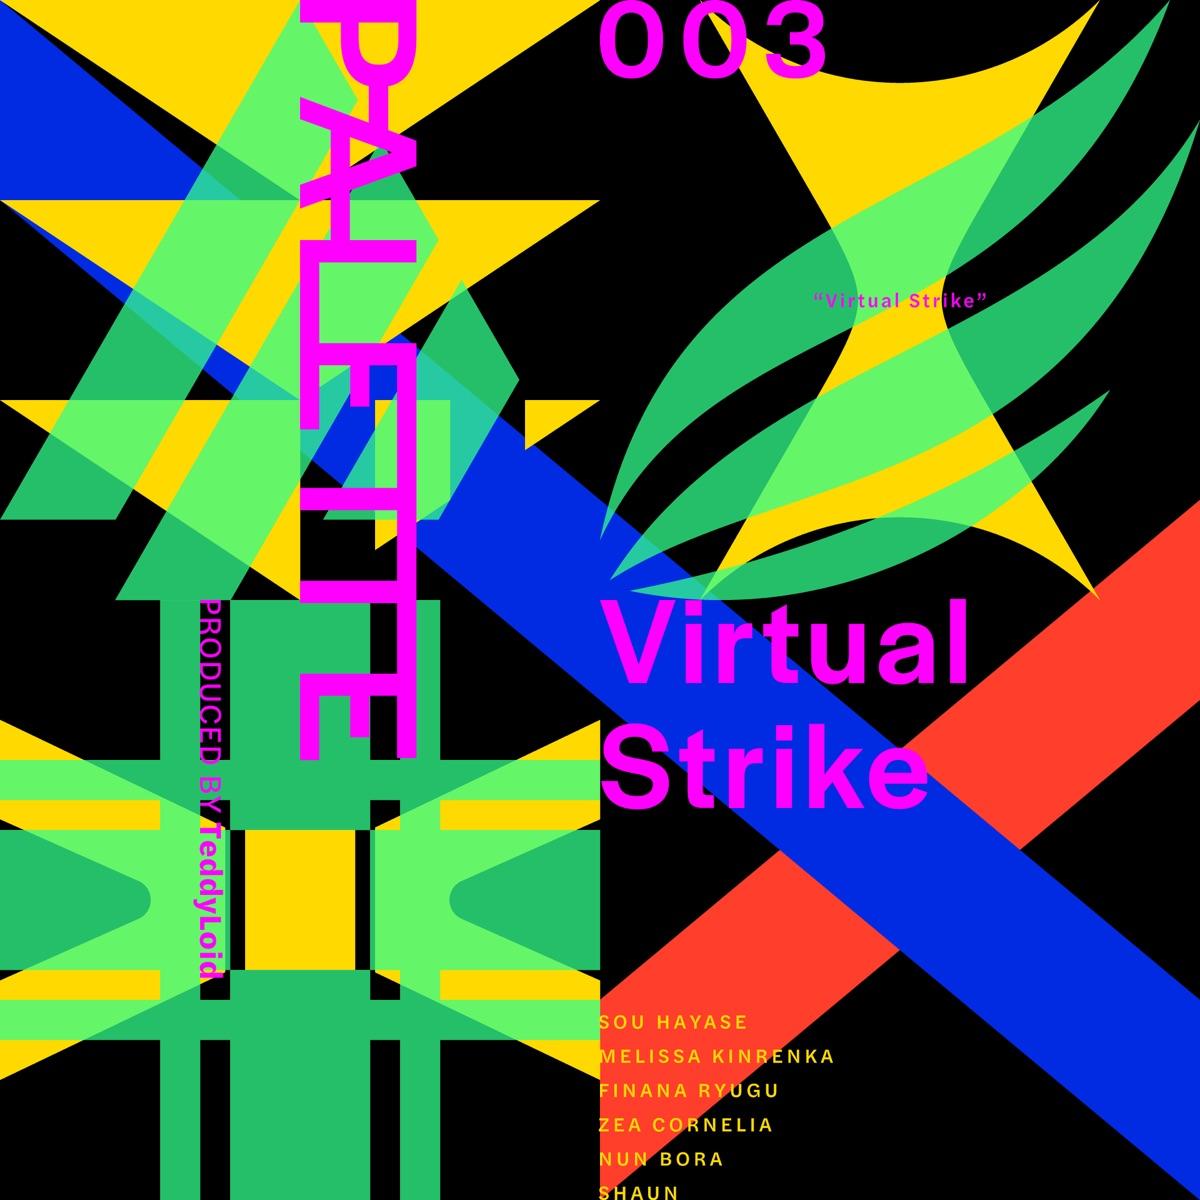 『NIJISANJI ID - Virtual Strike (Indonesian Ver.) feat. ZEA Cornelia』収録の『PALETTE 003 - Virtual Strike』ジャケット